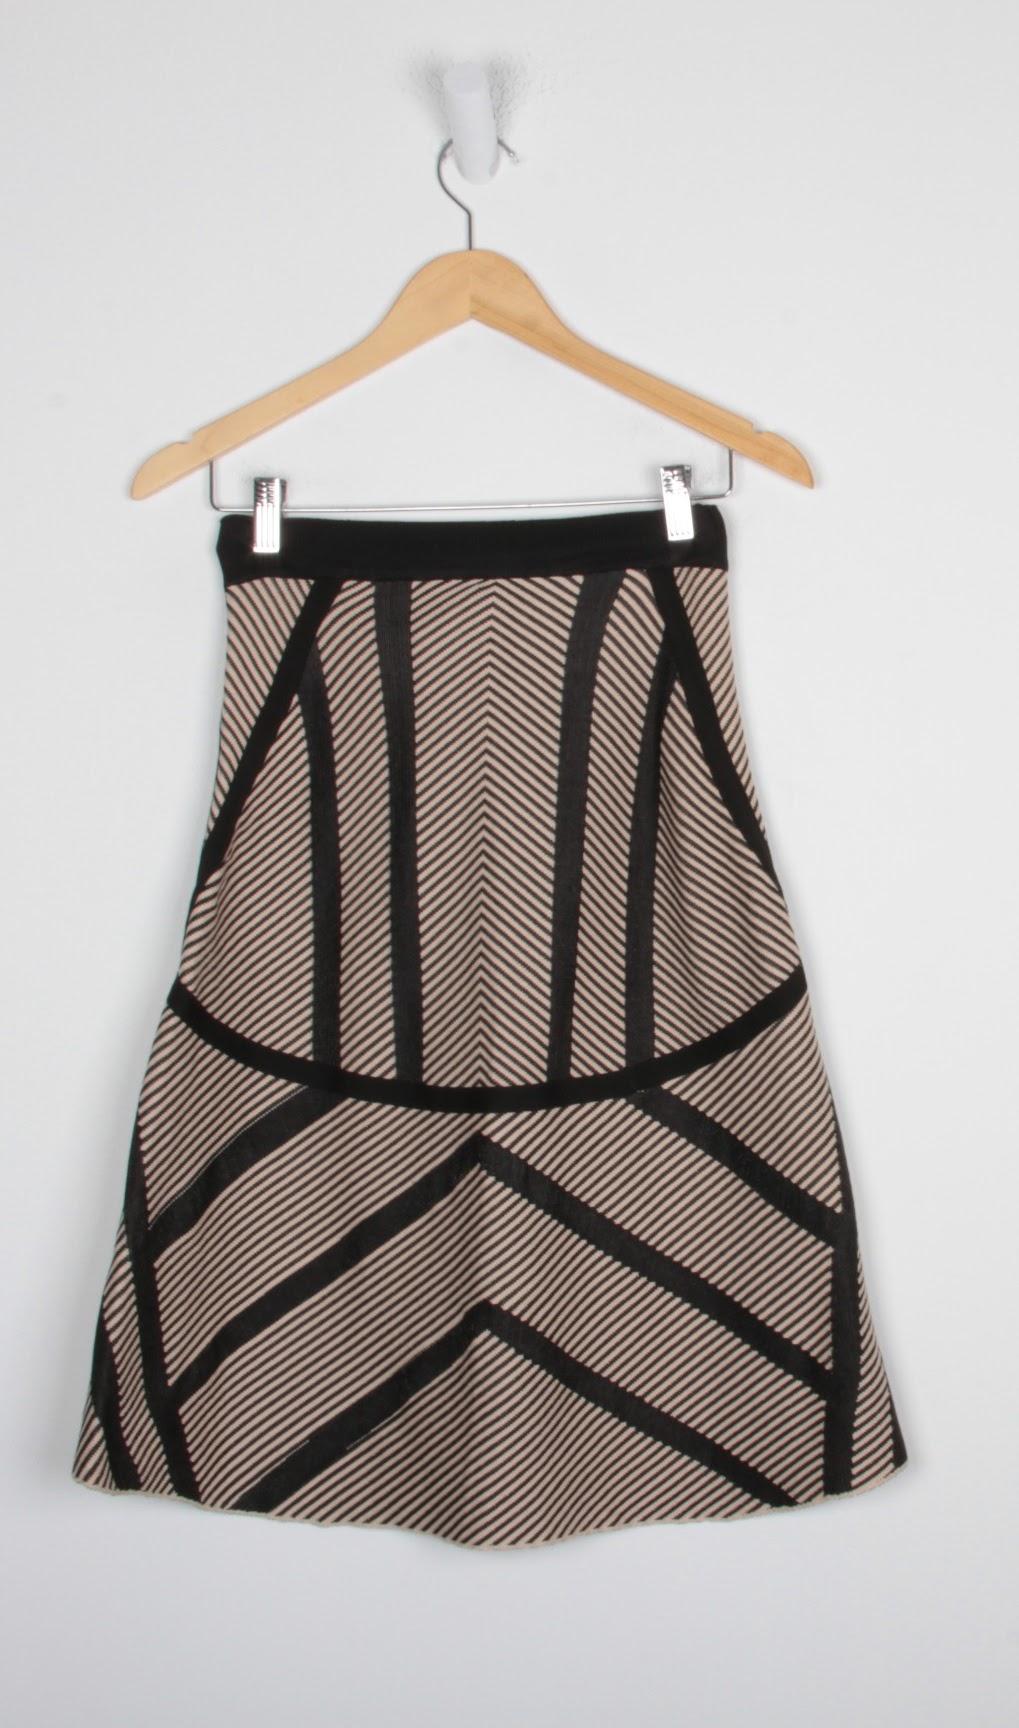 Saia Curta  Tricot - Espaço Fashion - P